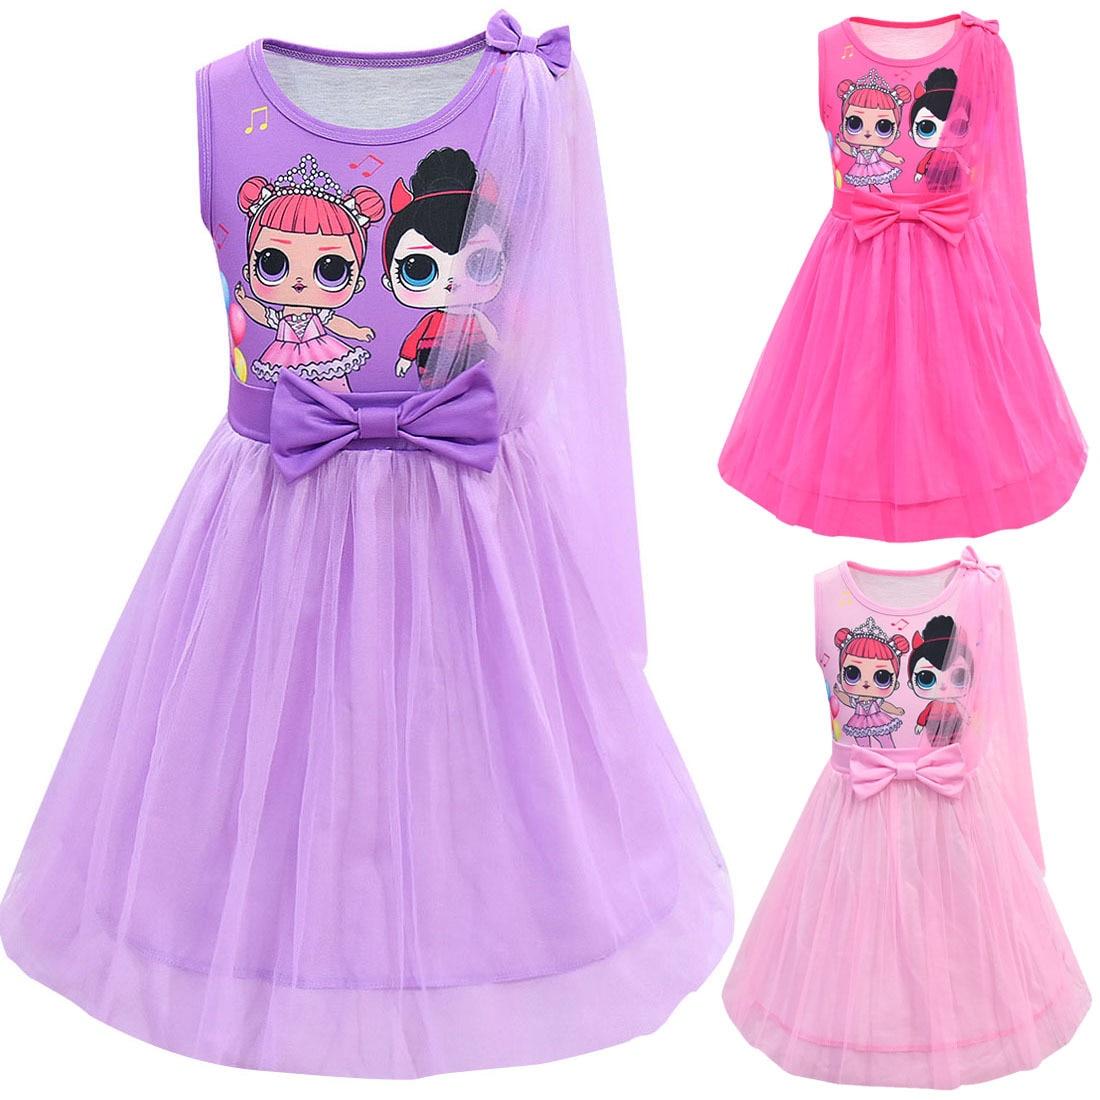 LOL Big Sister Dolls Cosplay Costume Kid Sleeveless Cartoon Dress Purple Skirt